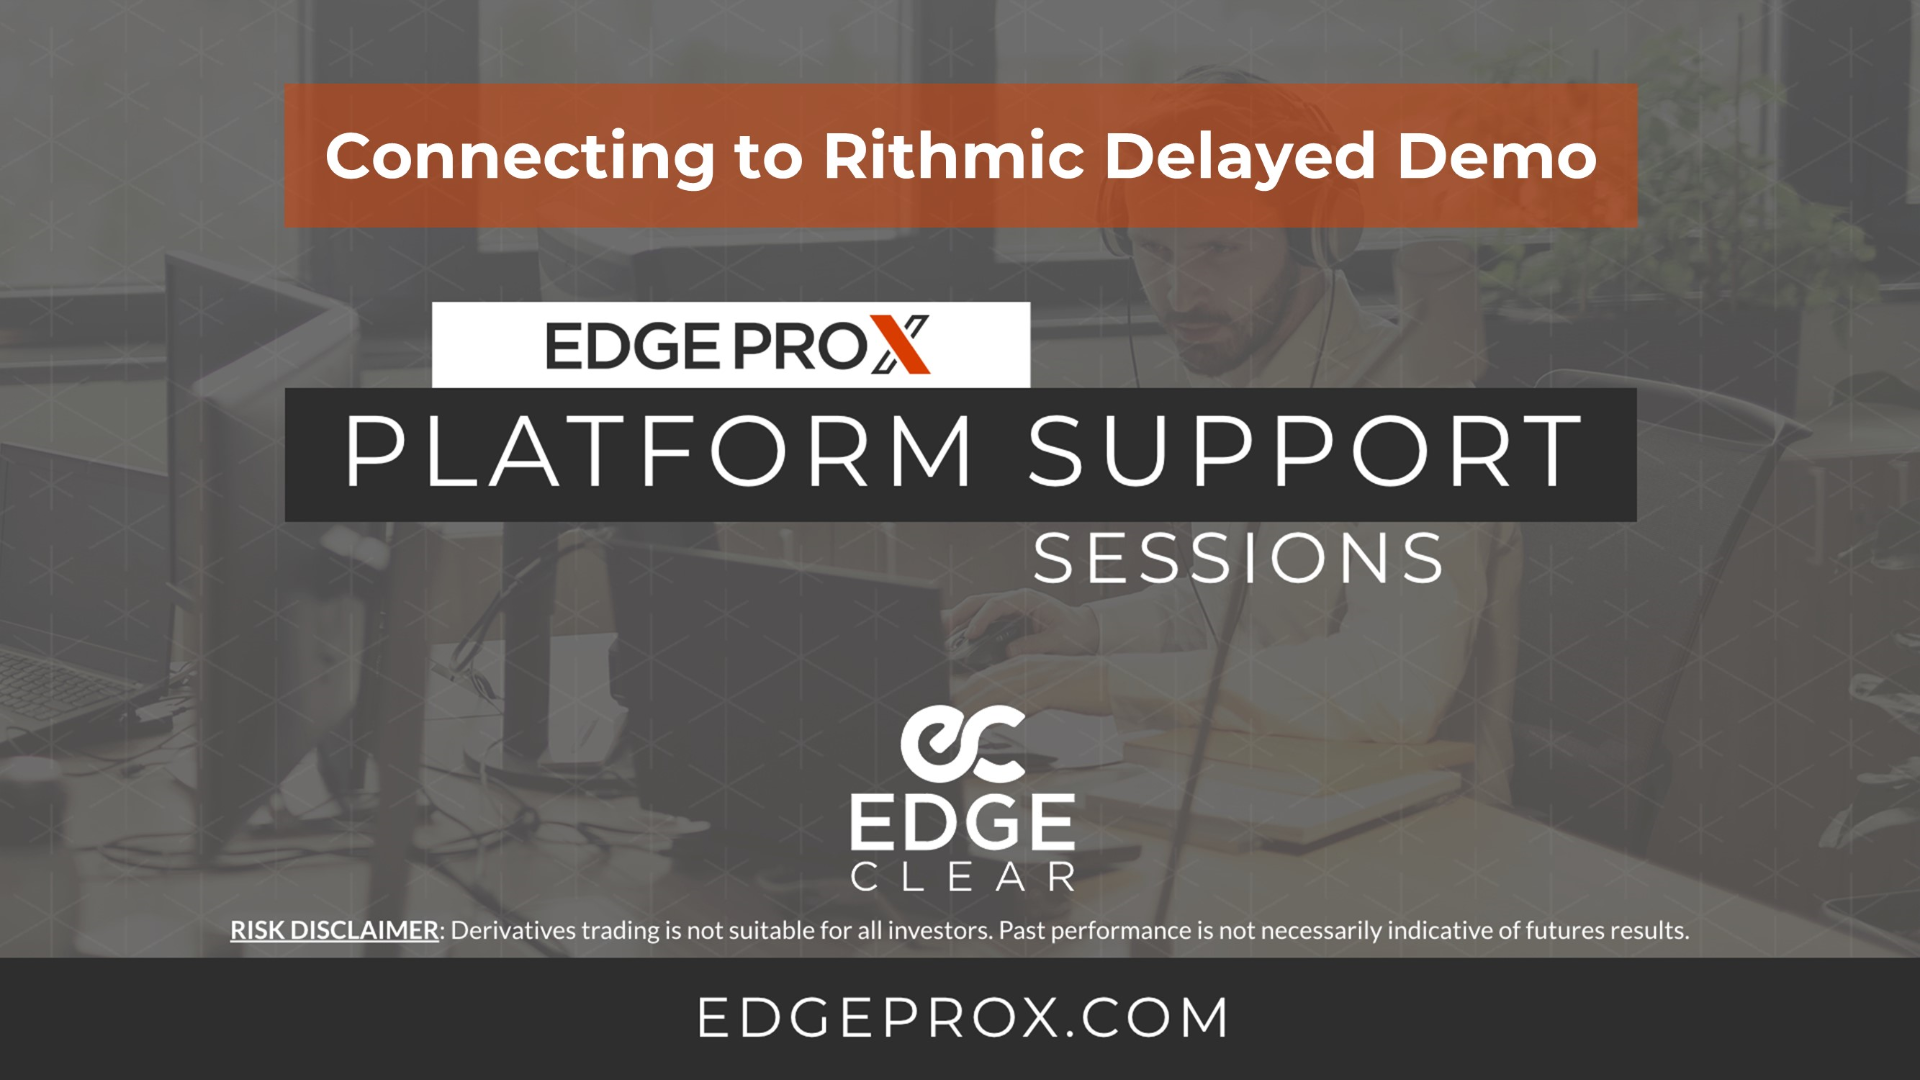 EdgeProX Rithmic Delayed Demo Setup